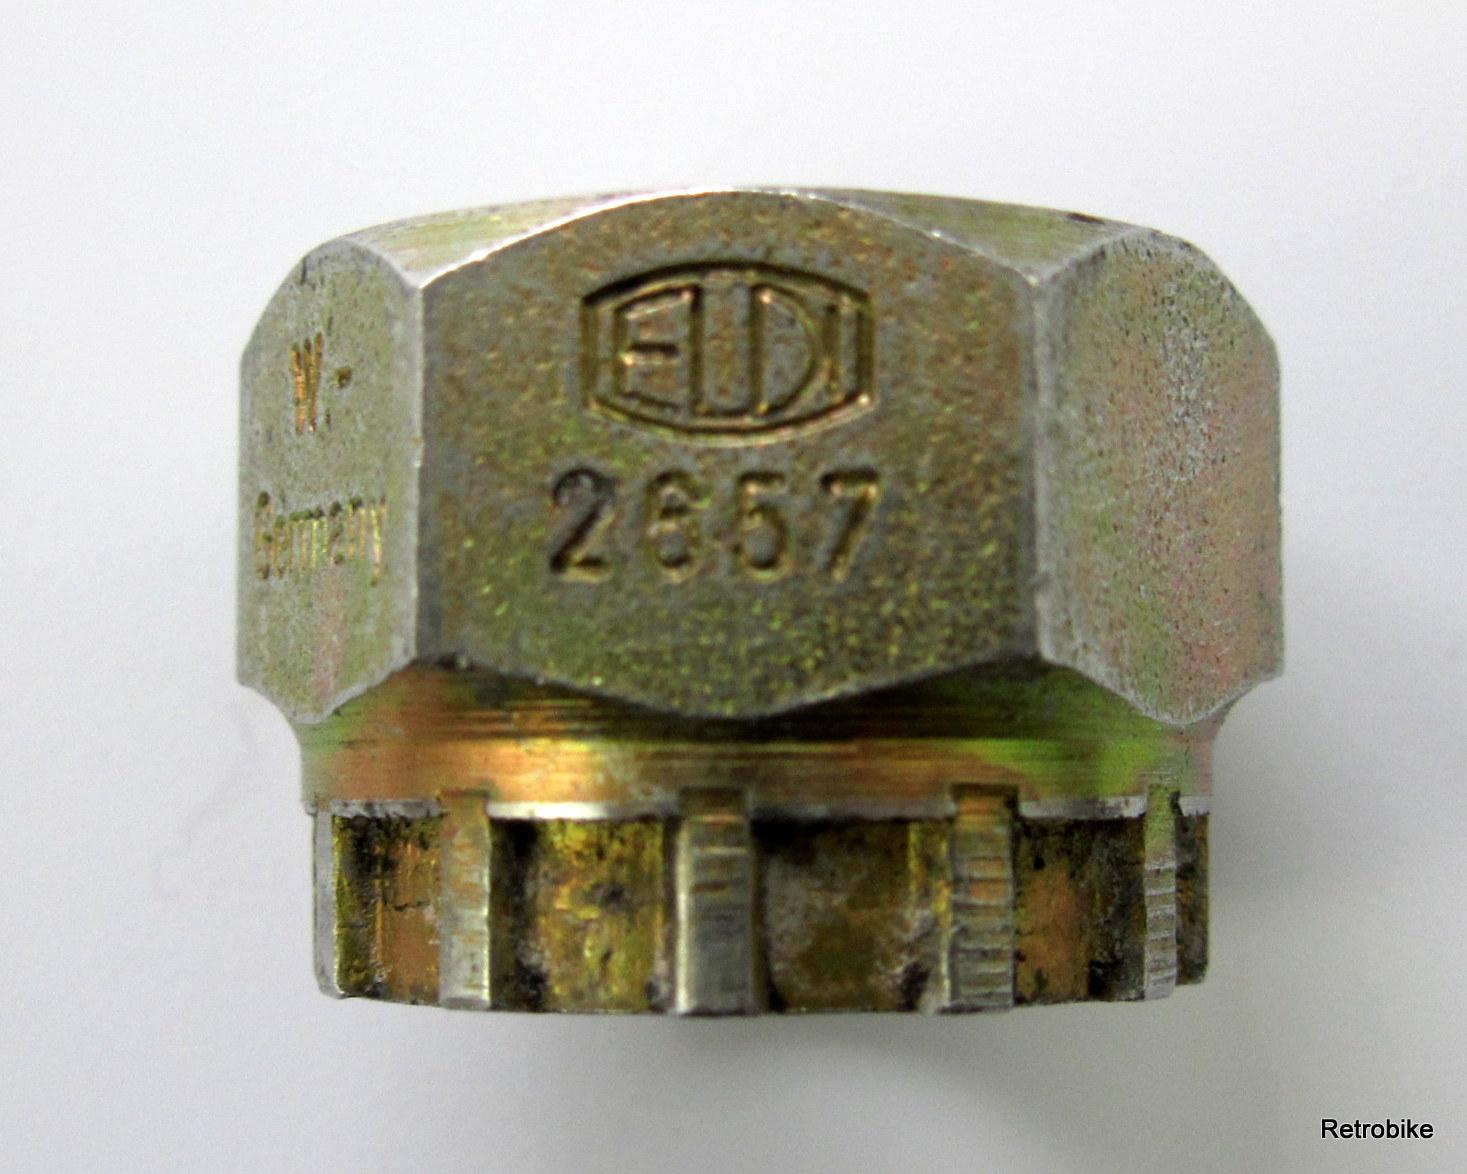 Eldi Abzieher 2646